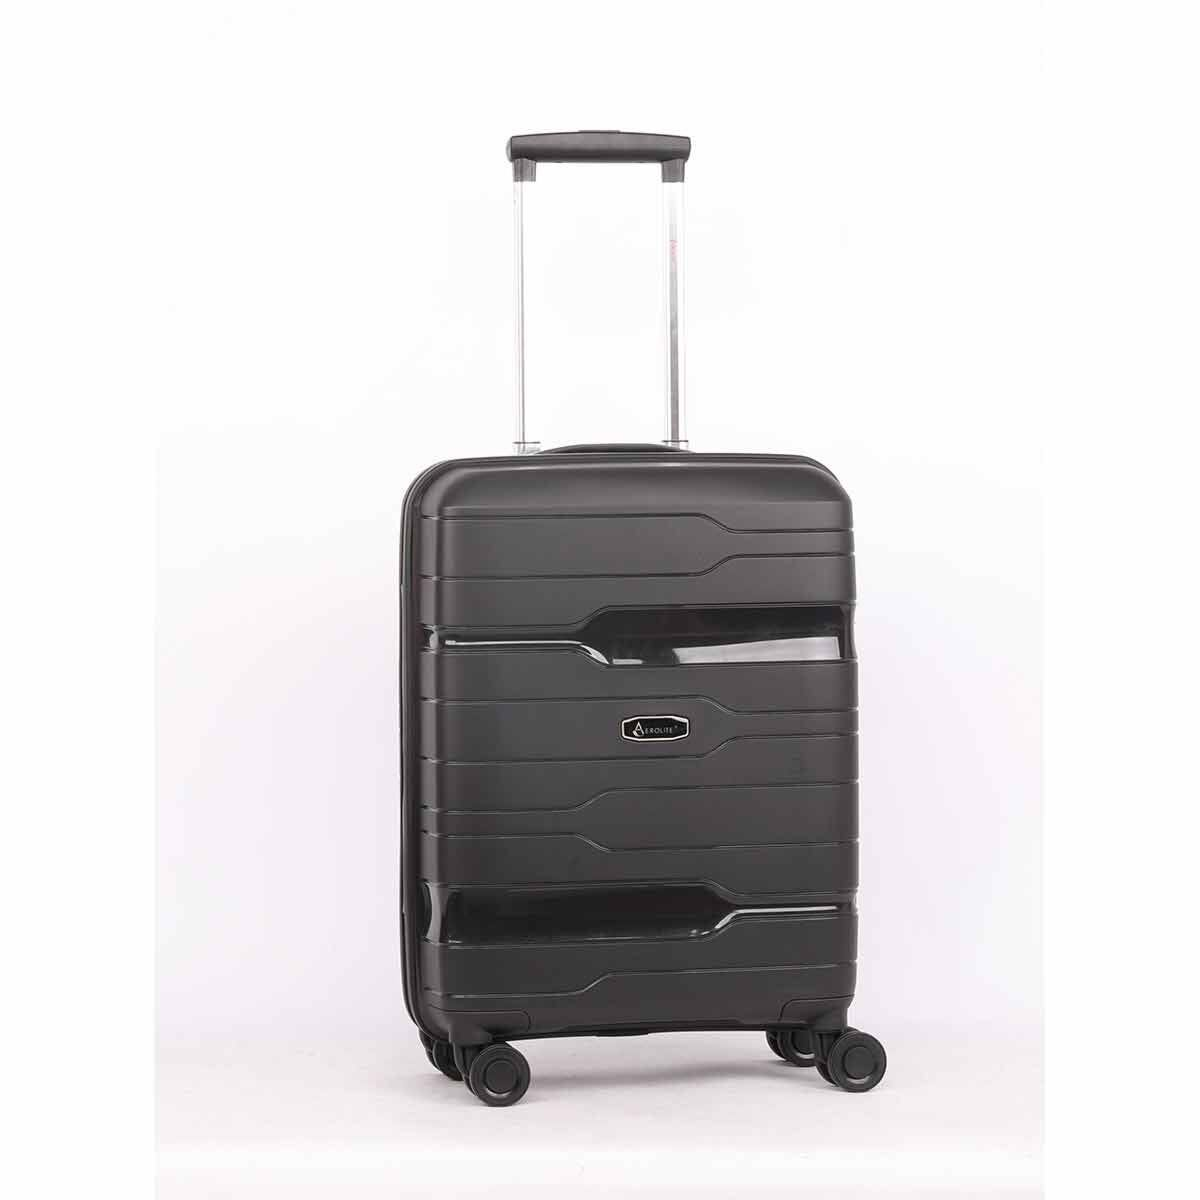 Aerolite 8 Wheel Hard Shell Cabin Luggage Case